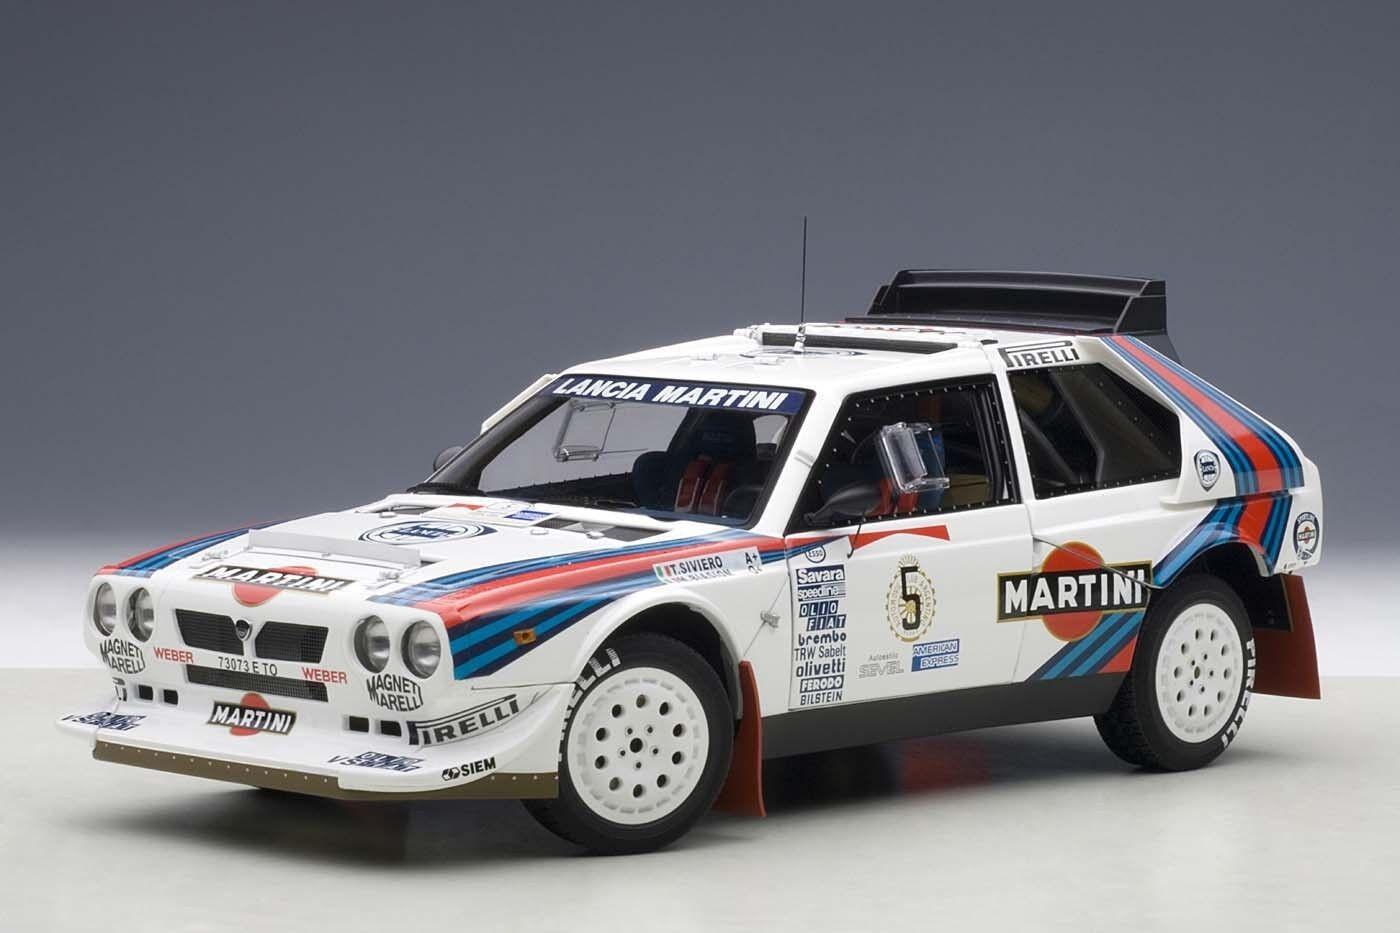 1986 LANCIA DELTA S4 MARTINI WINNER argentoINA  18 AUTOART 88621 NEW IN BOX